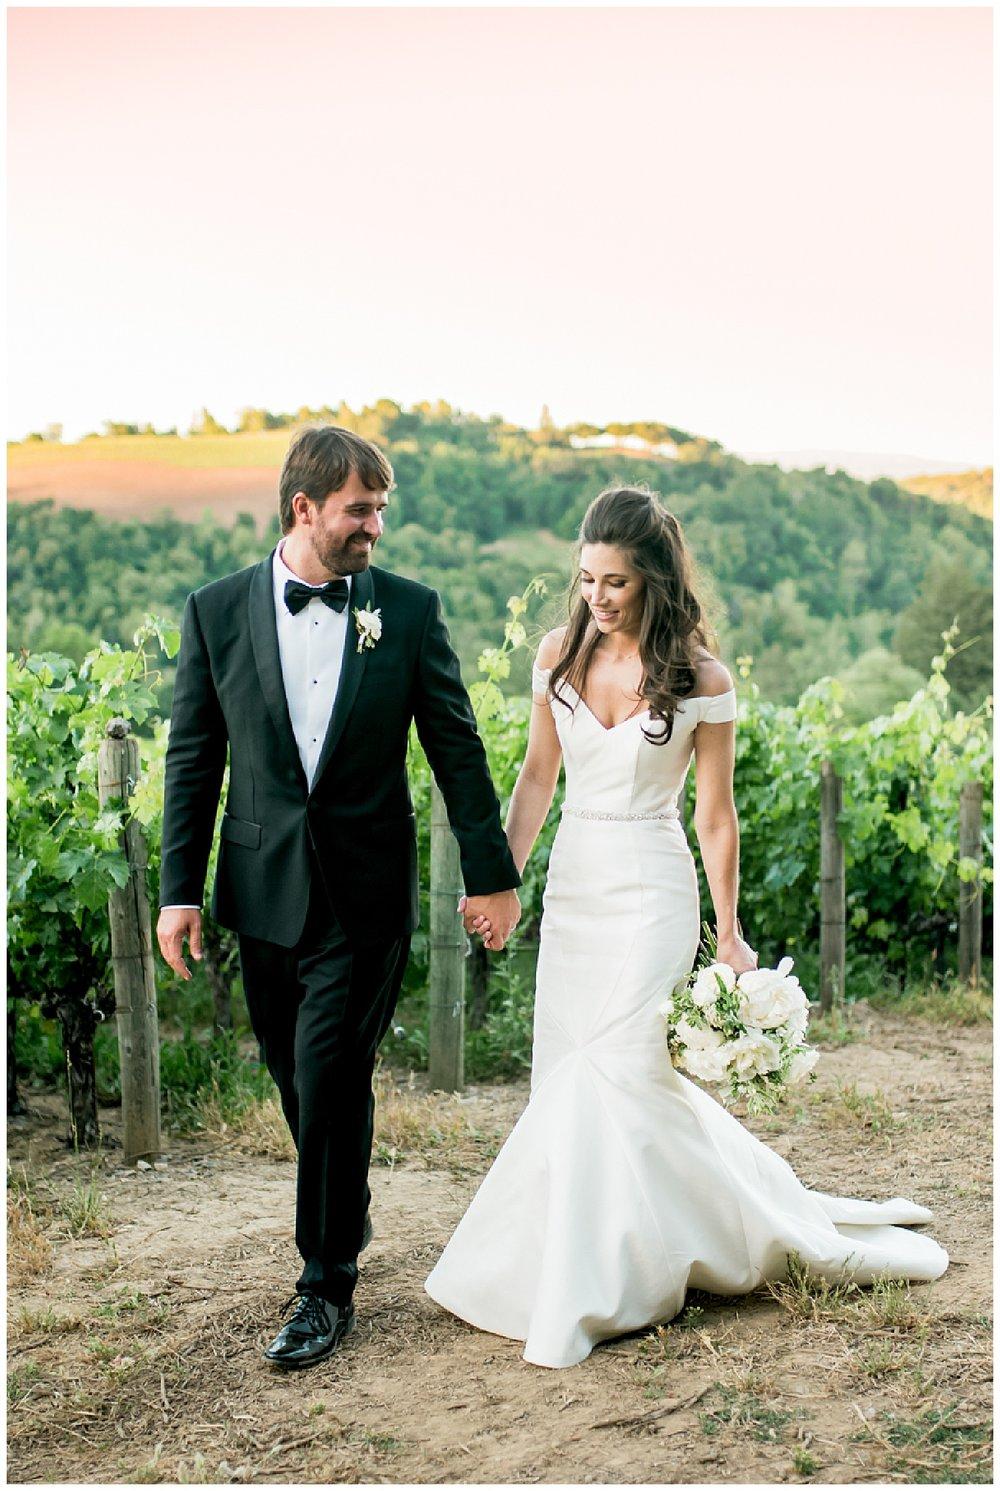 Janine_Licare_Photography_San_Francisco_Wedding_Photographer_0148.jpg